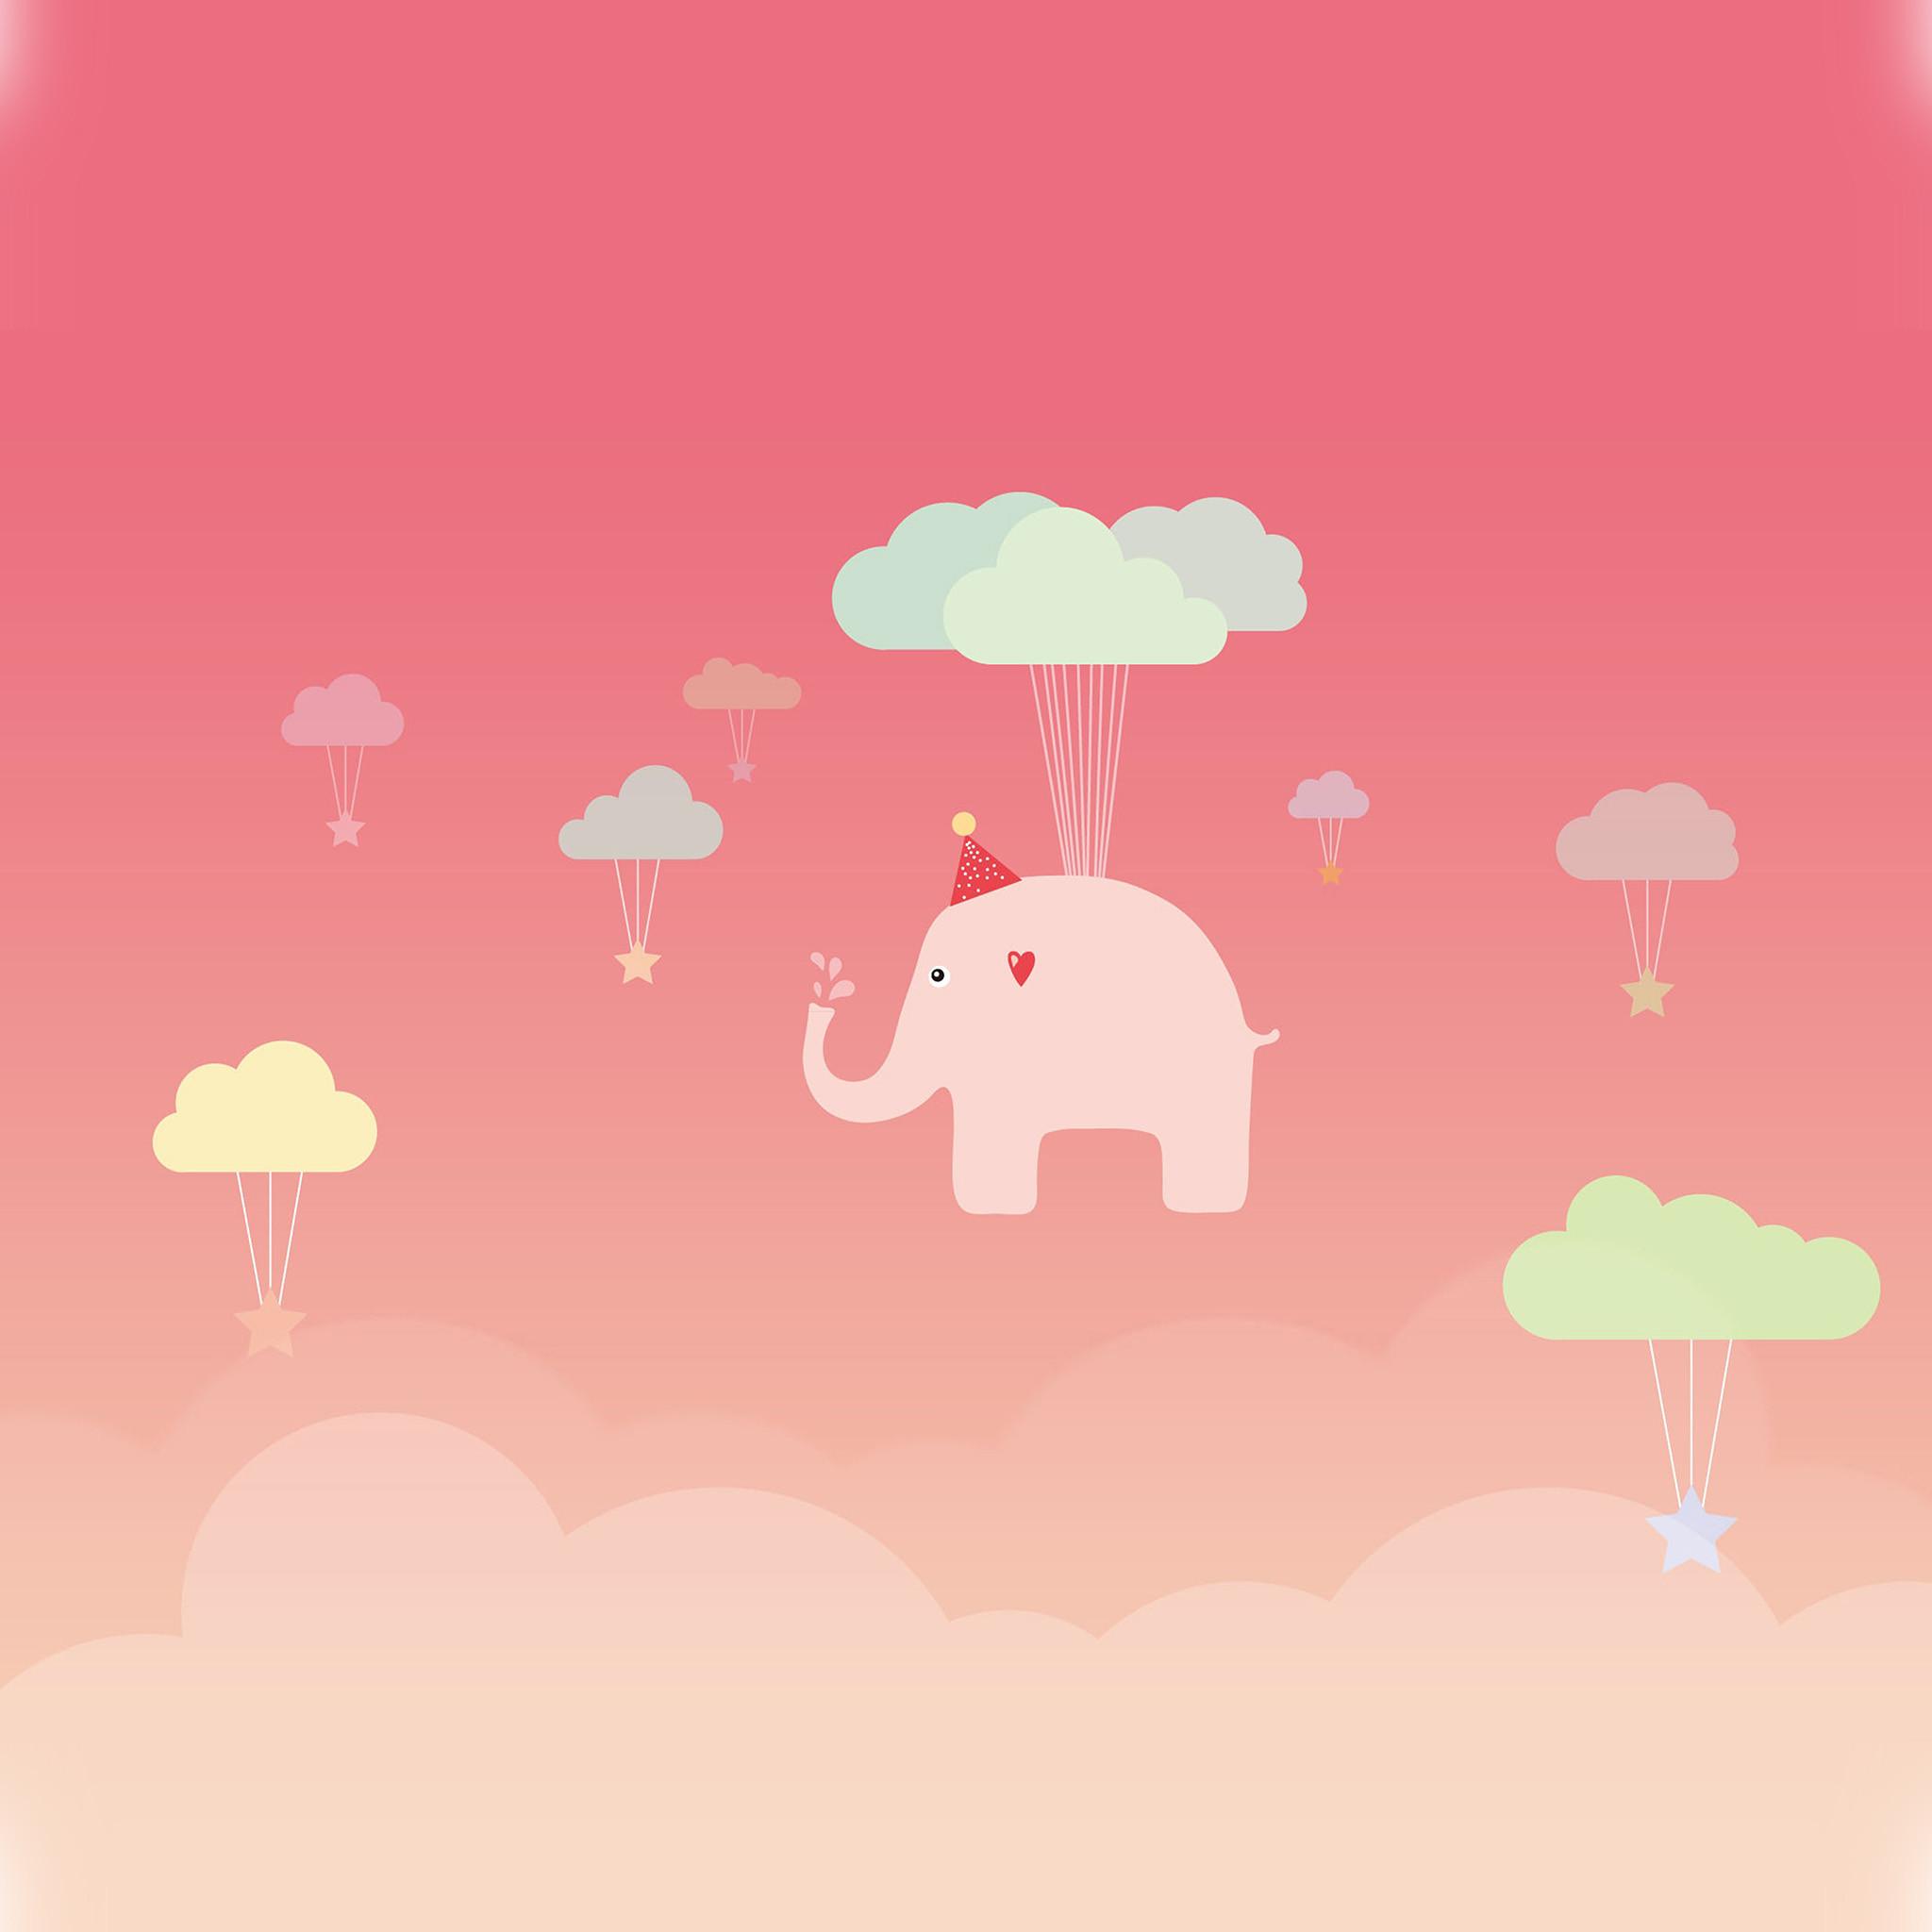 958 2: Cute Elephant Illustration Art Pink Fly iPad Air wallpaper